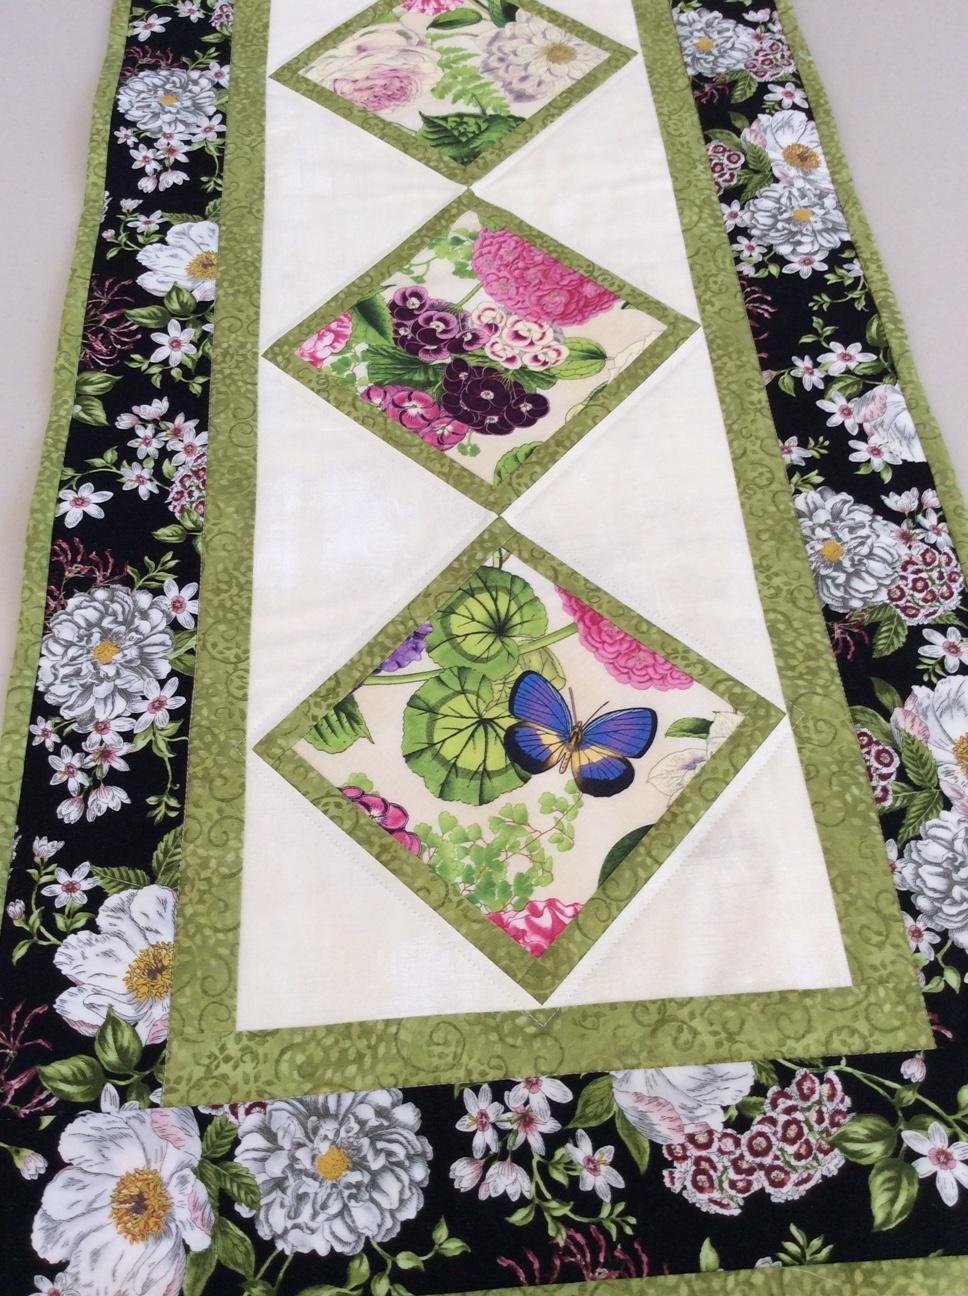 Table Runner - Summer Garden by  Della Cronkrite